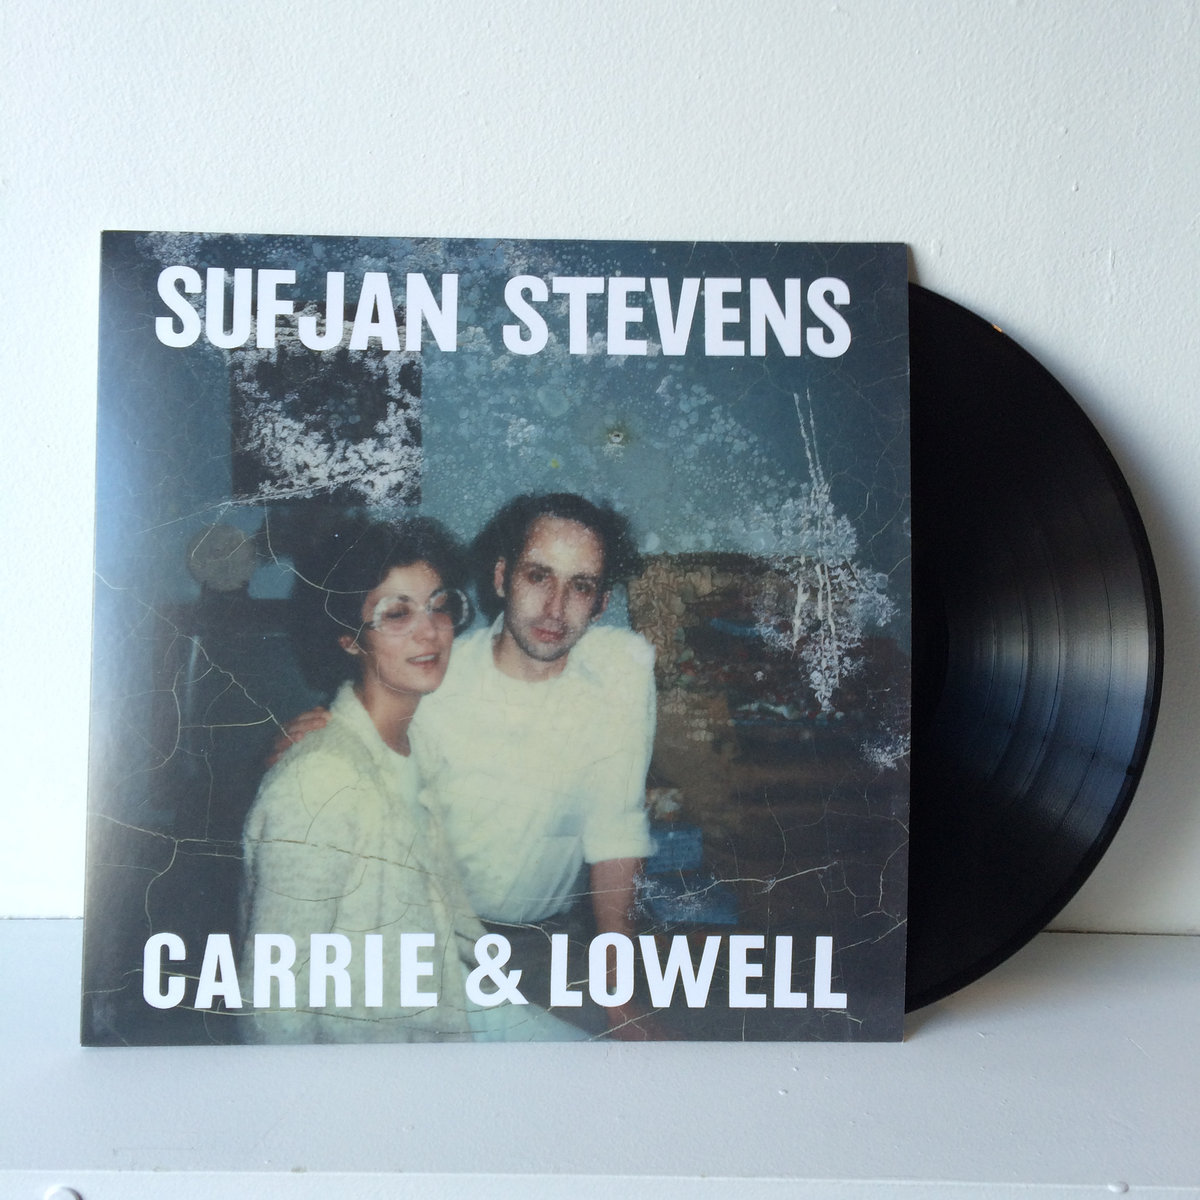 Sufjan Stevens | Free Listening on SoundCloud